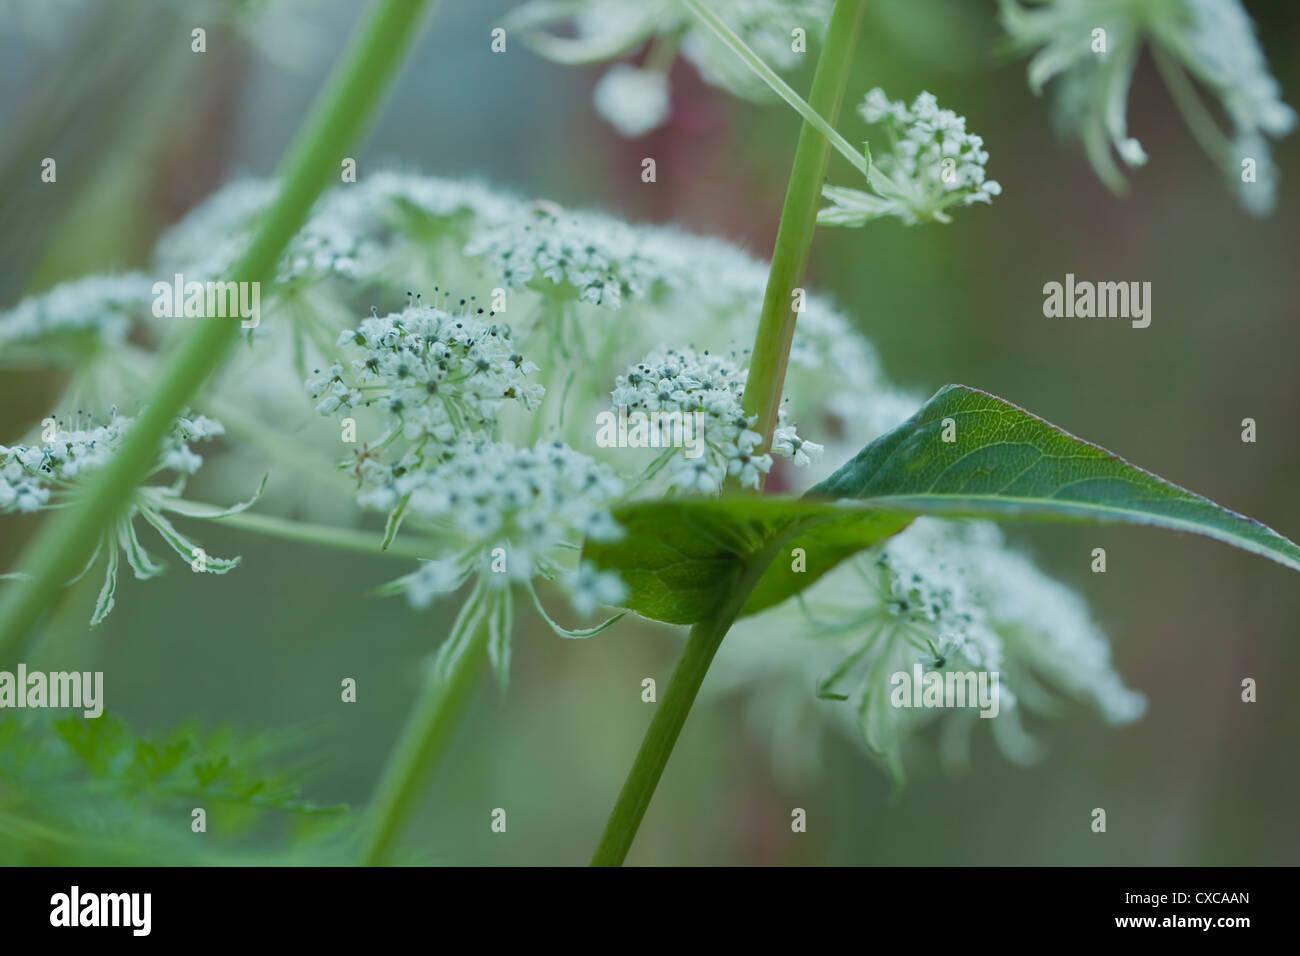 Selinum wallichianum umbellifer flowers resting against single stem, Persicara amplexicaulis 'Rosea', September, - Stock Image